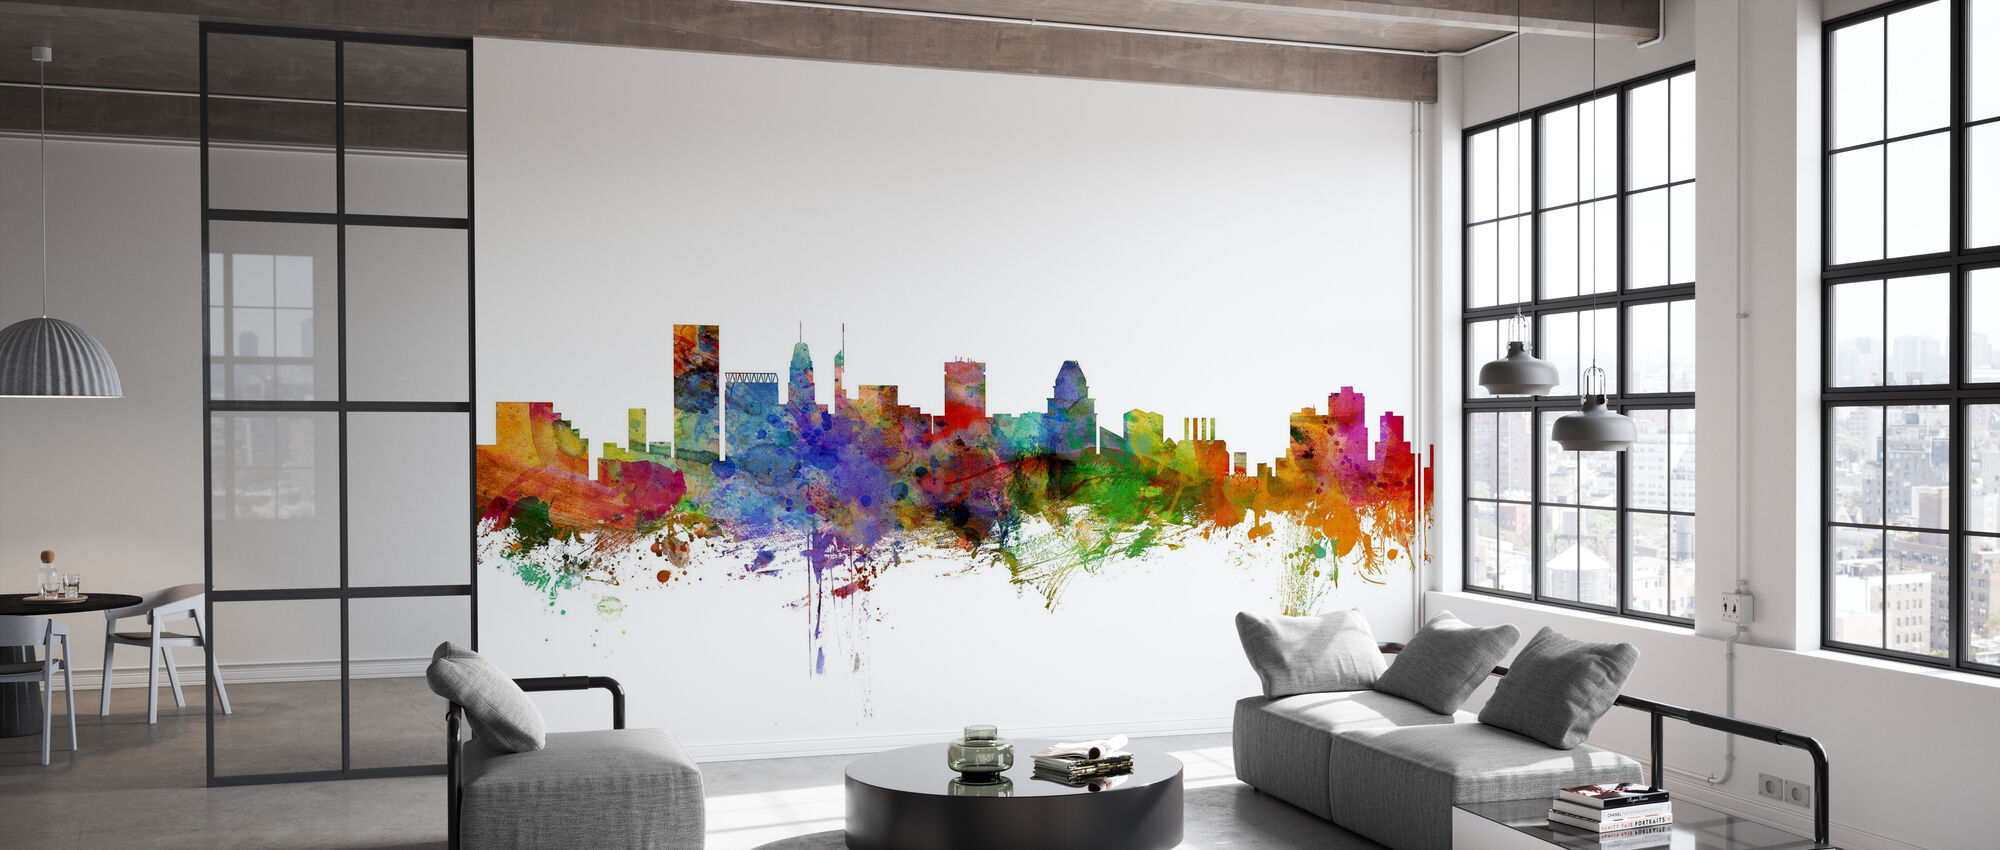 Baltimore Maryland Skyline - Wallpaper - Office